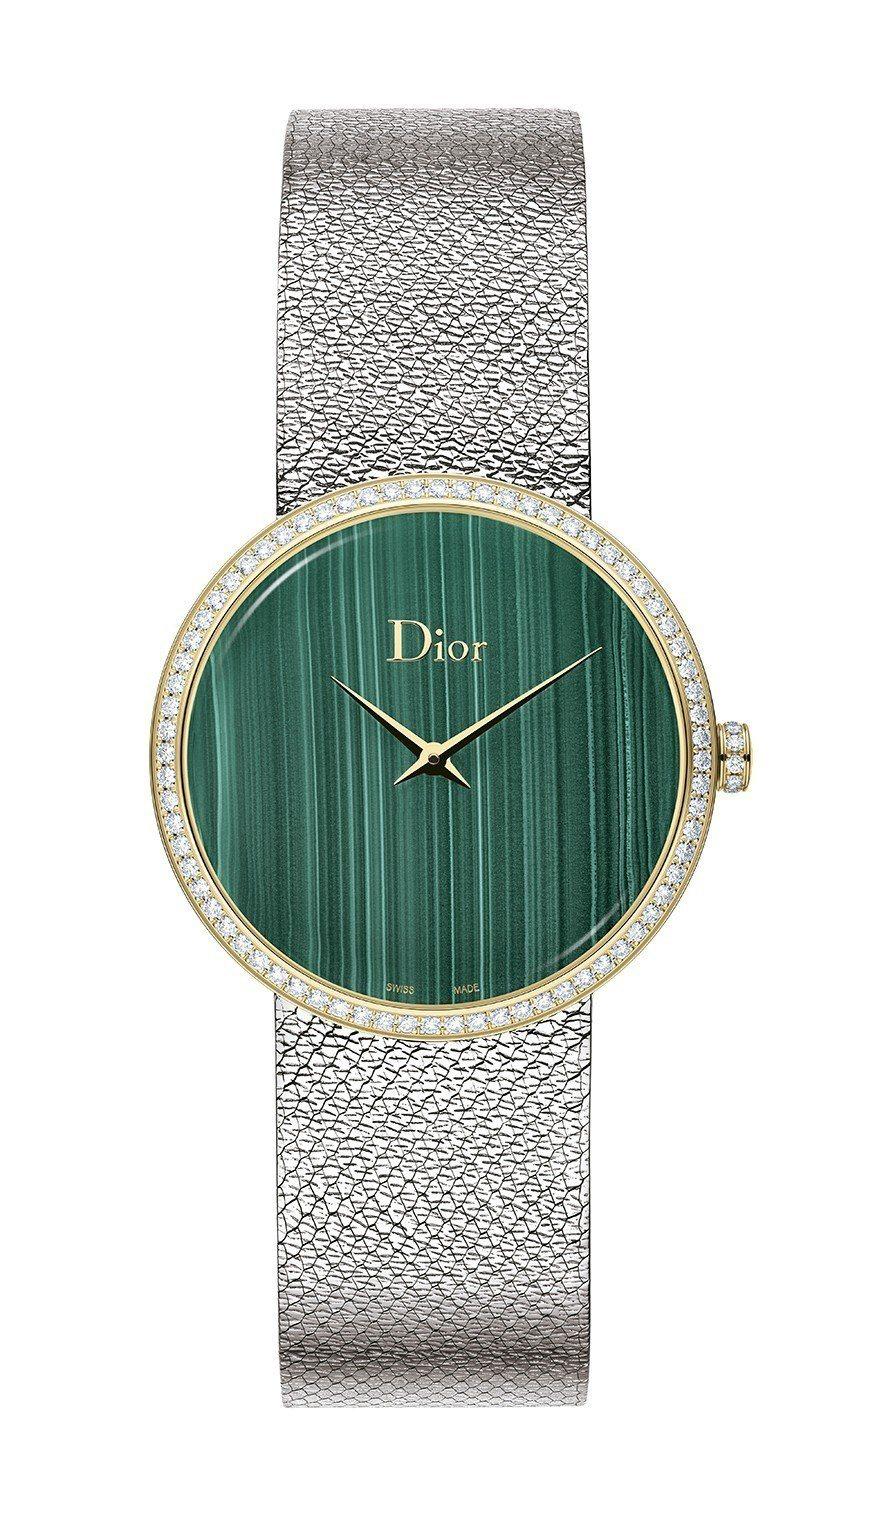 Dior La D de Dior Satine腕表,不鏽鋼表殼搭配18K金表圈...